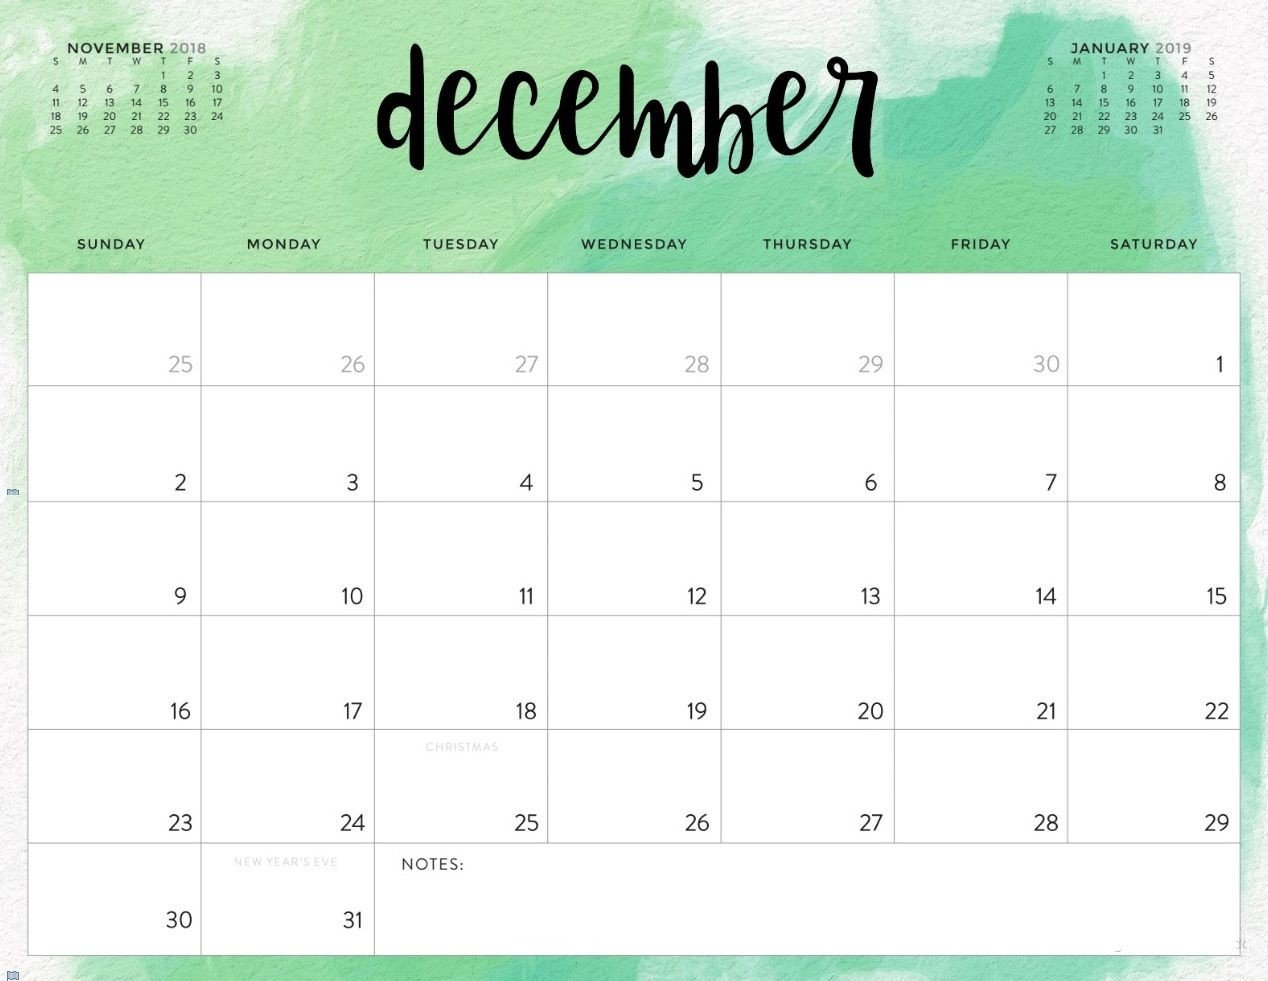 Custom Calendar For Business – Marry Steven – Medium Calendar That I Can Edit